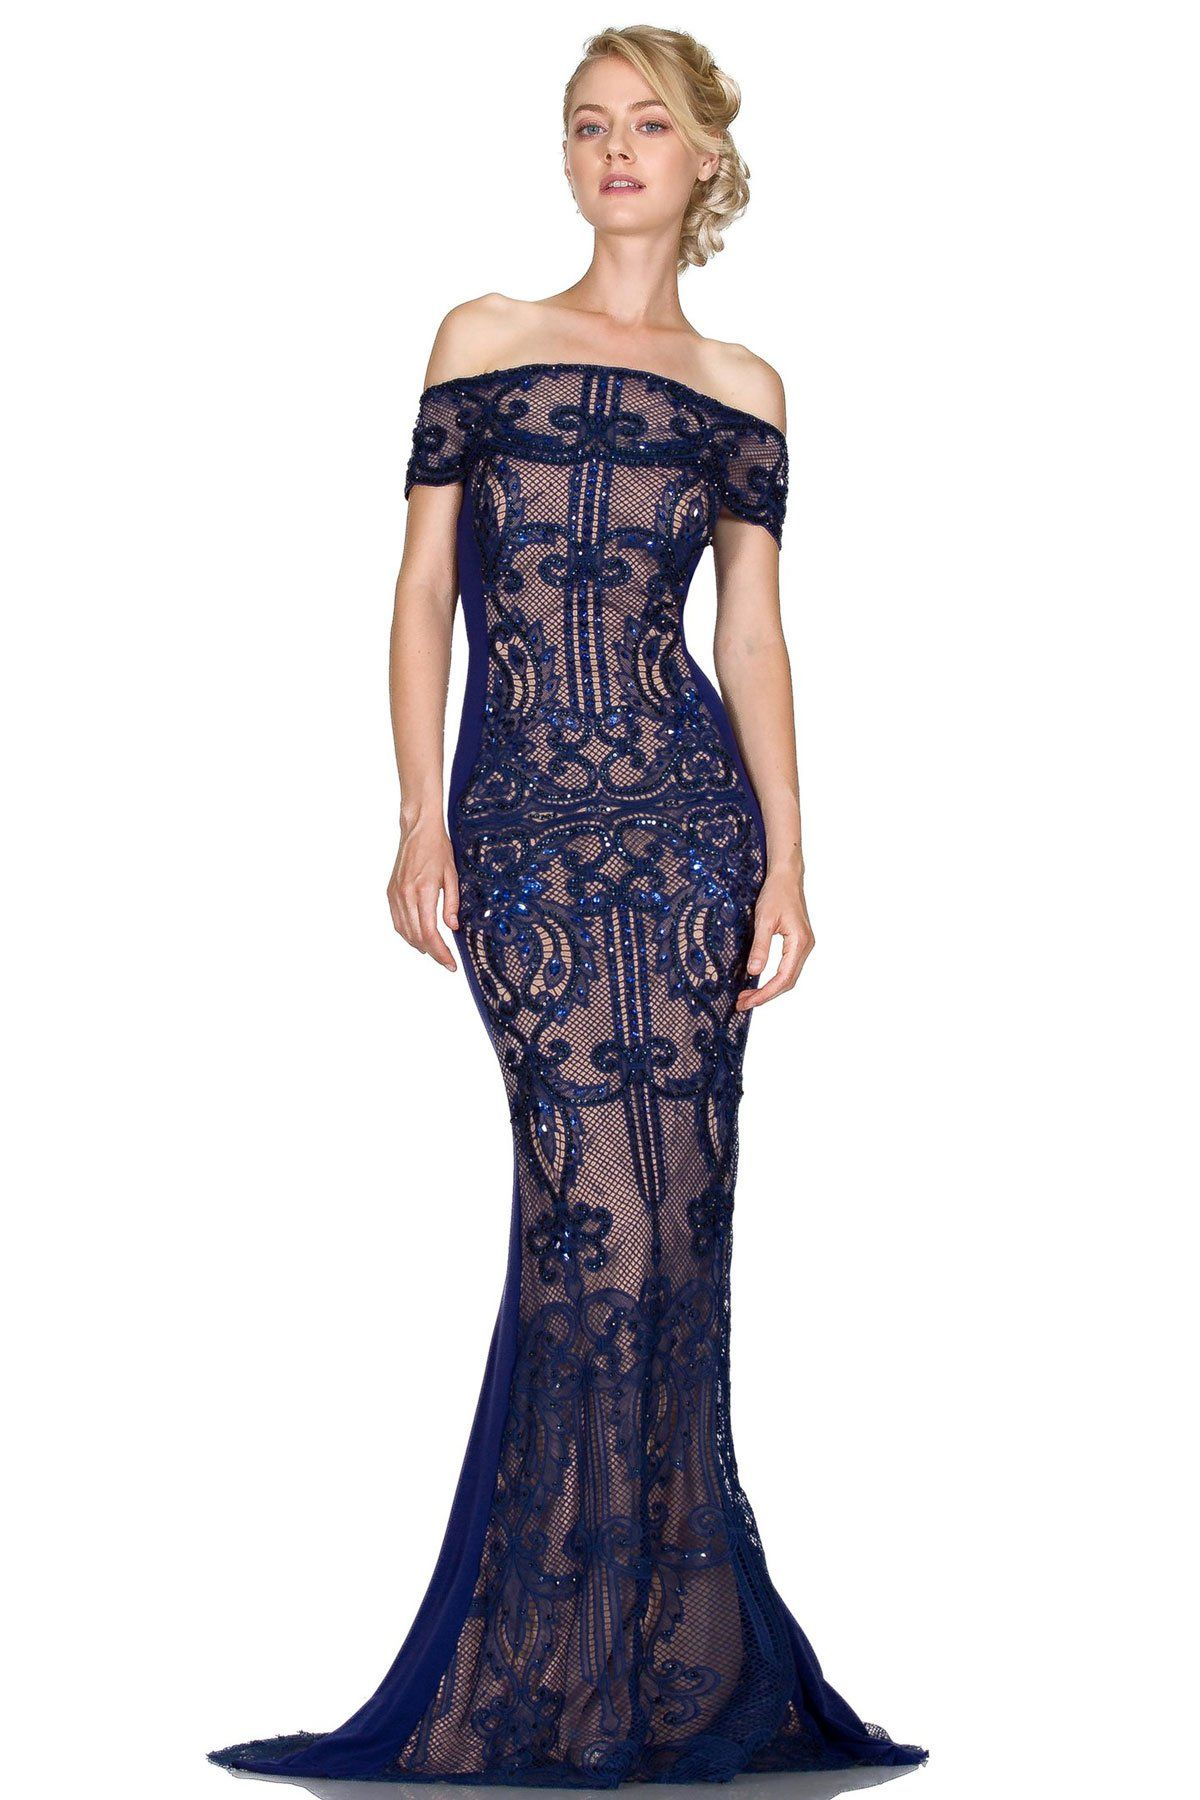 Strapless prom dress cd strapless prom dresses prom and neckline